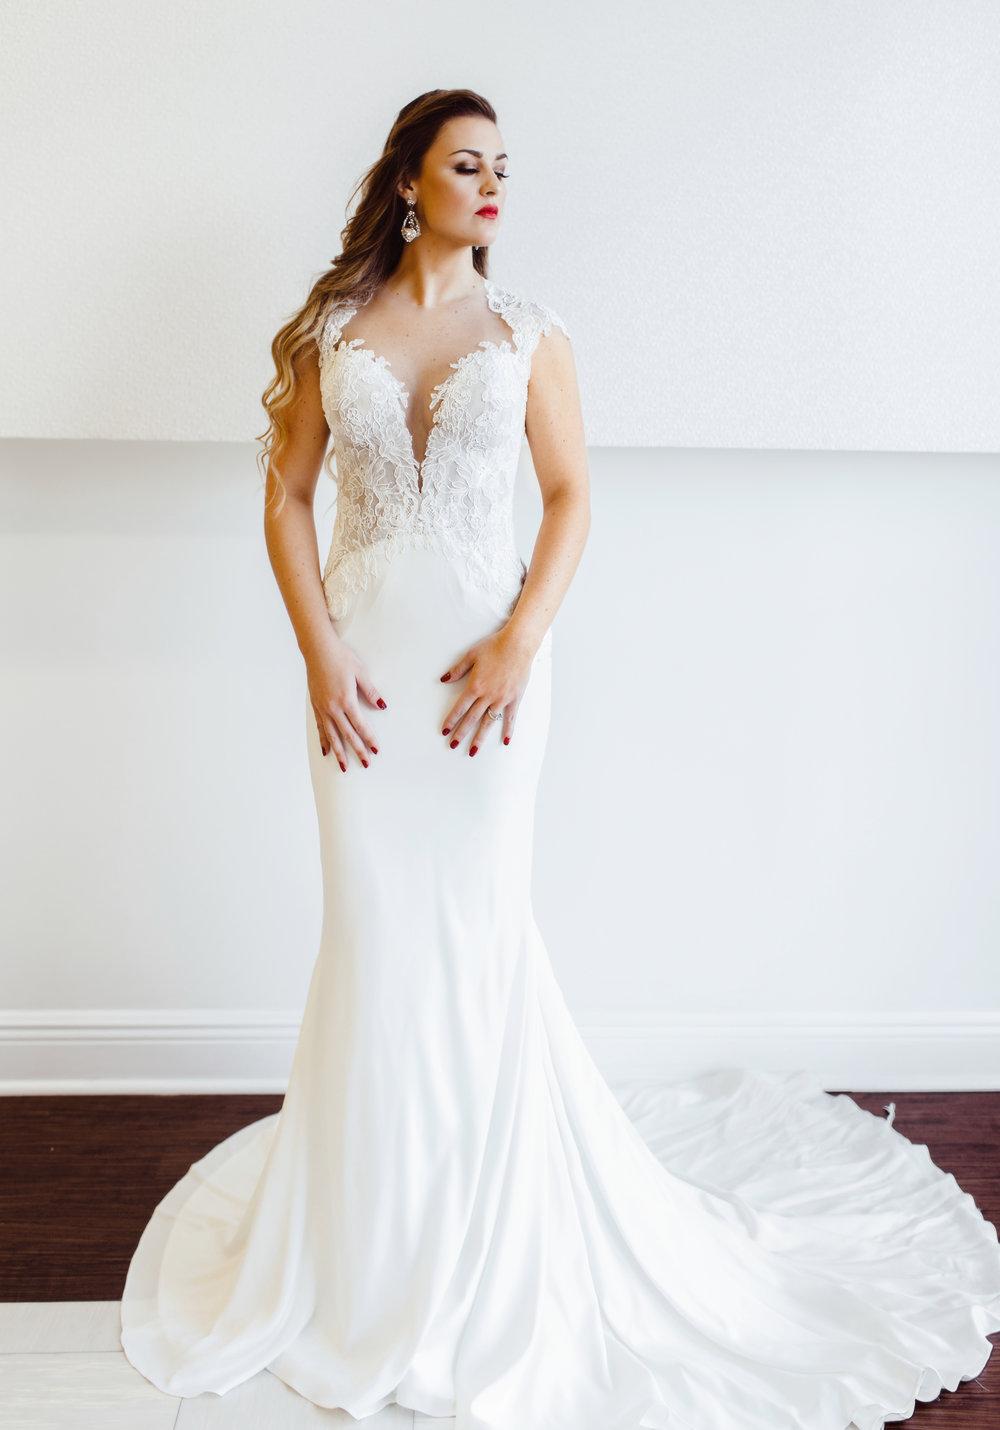 Solutions Bridal | Marisa Bridals | Vanessa Boy |Vanessaboy.com | orlando,fl-698.com |final.jpg